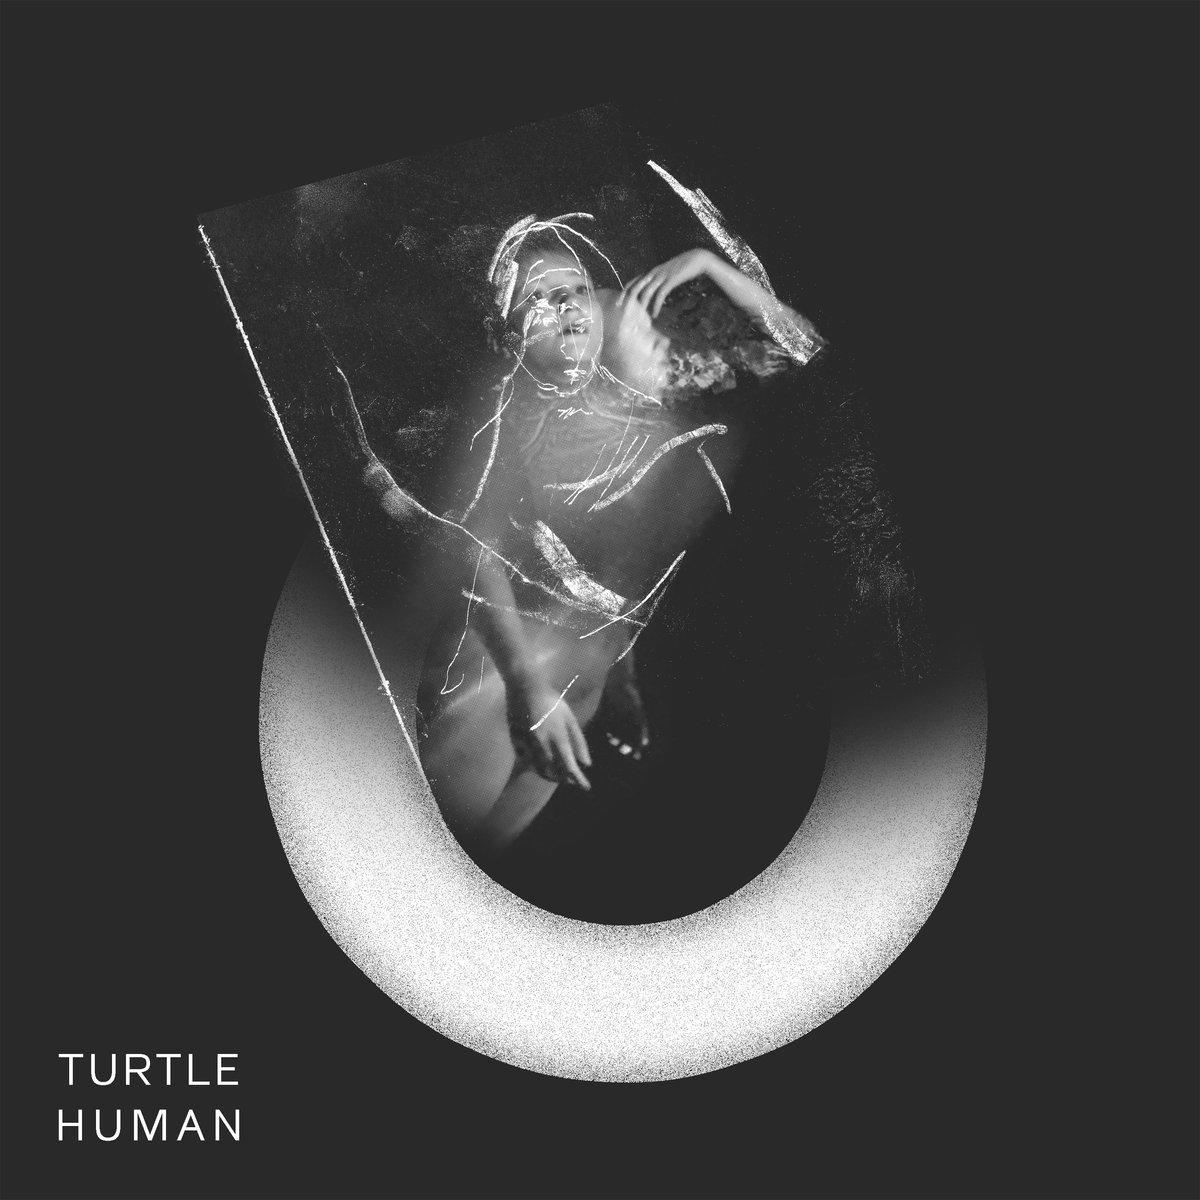 Turtle - Human - Cone Magazine